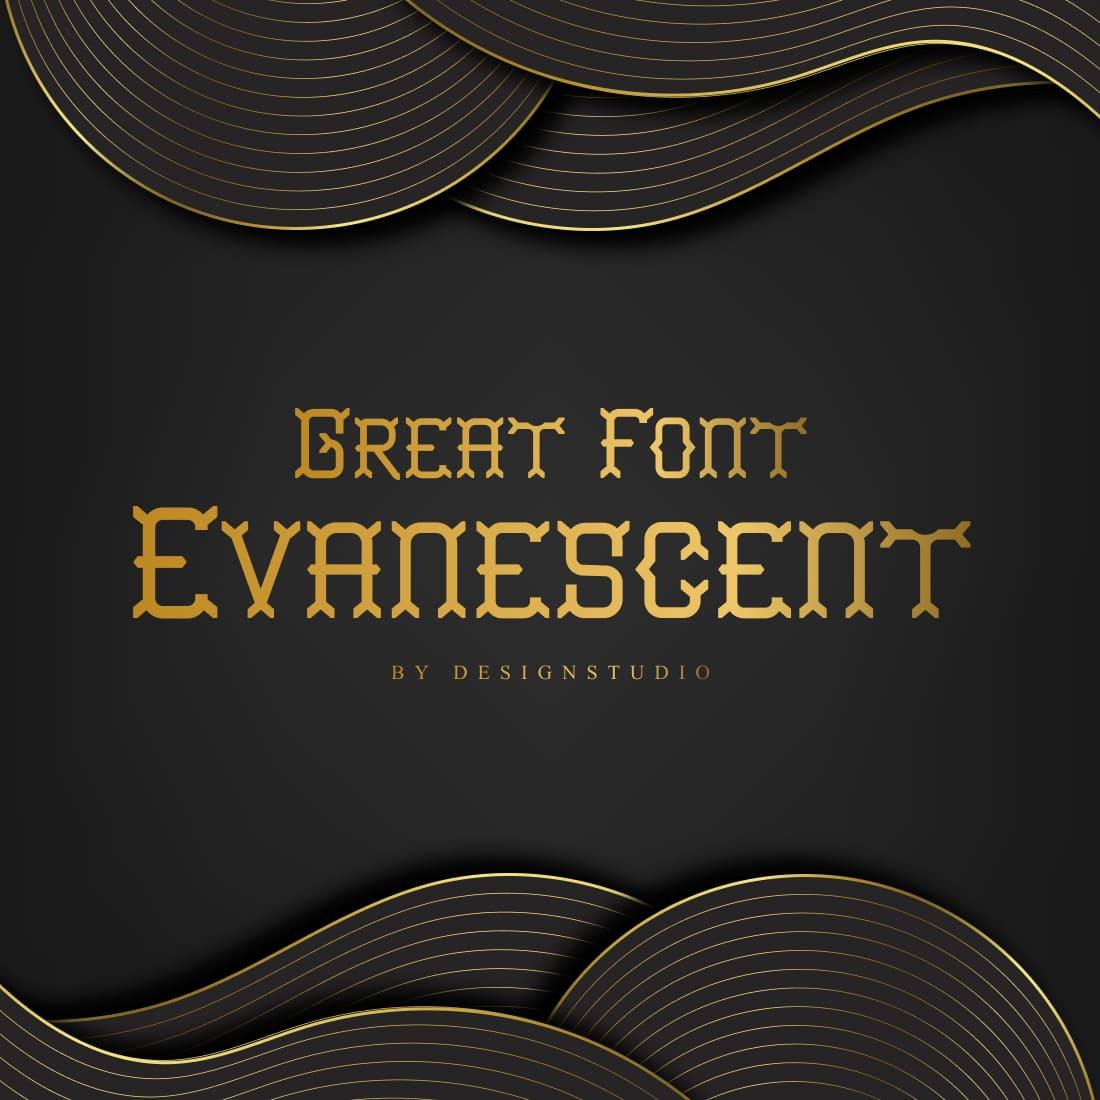 Evanescent Slab Serif Font cover image.